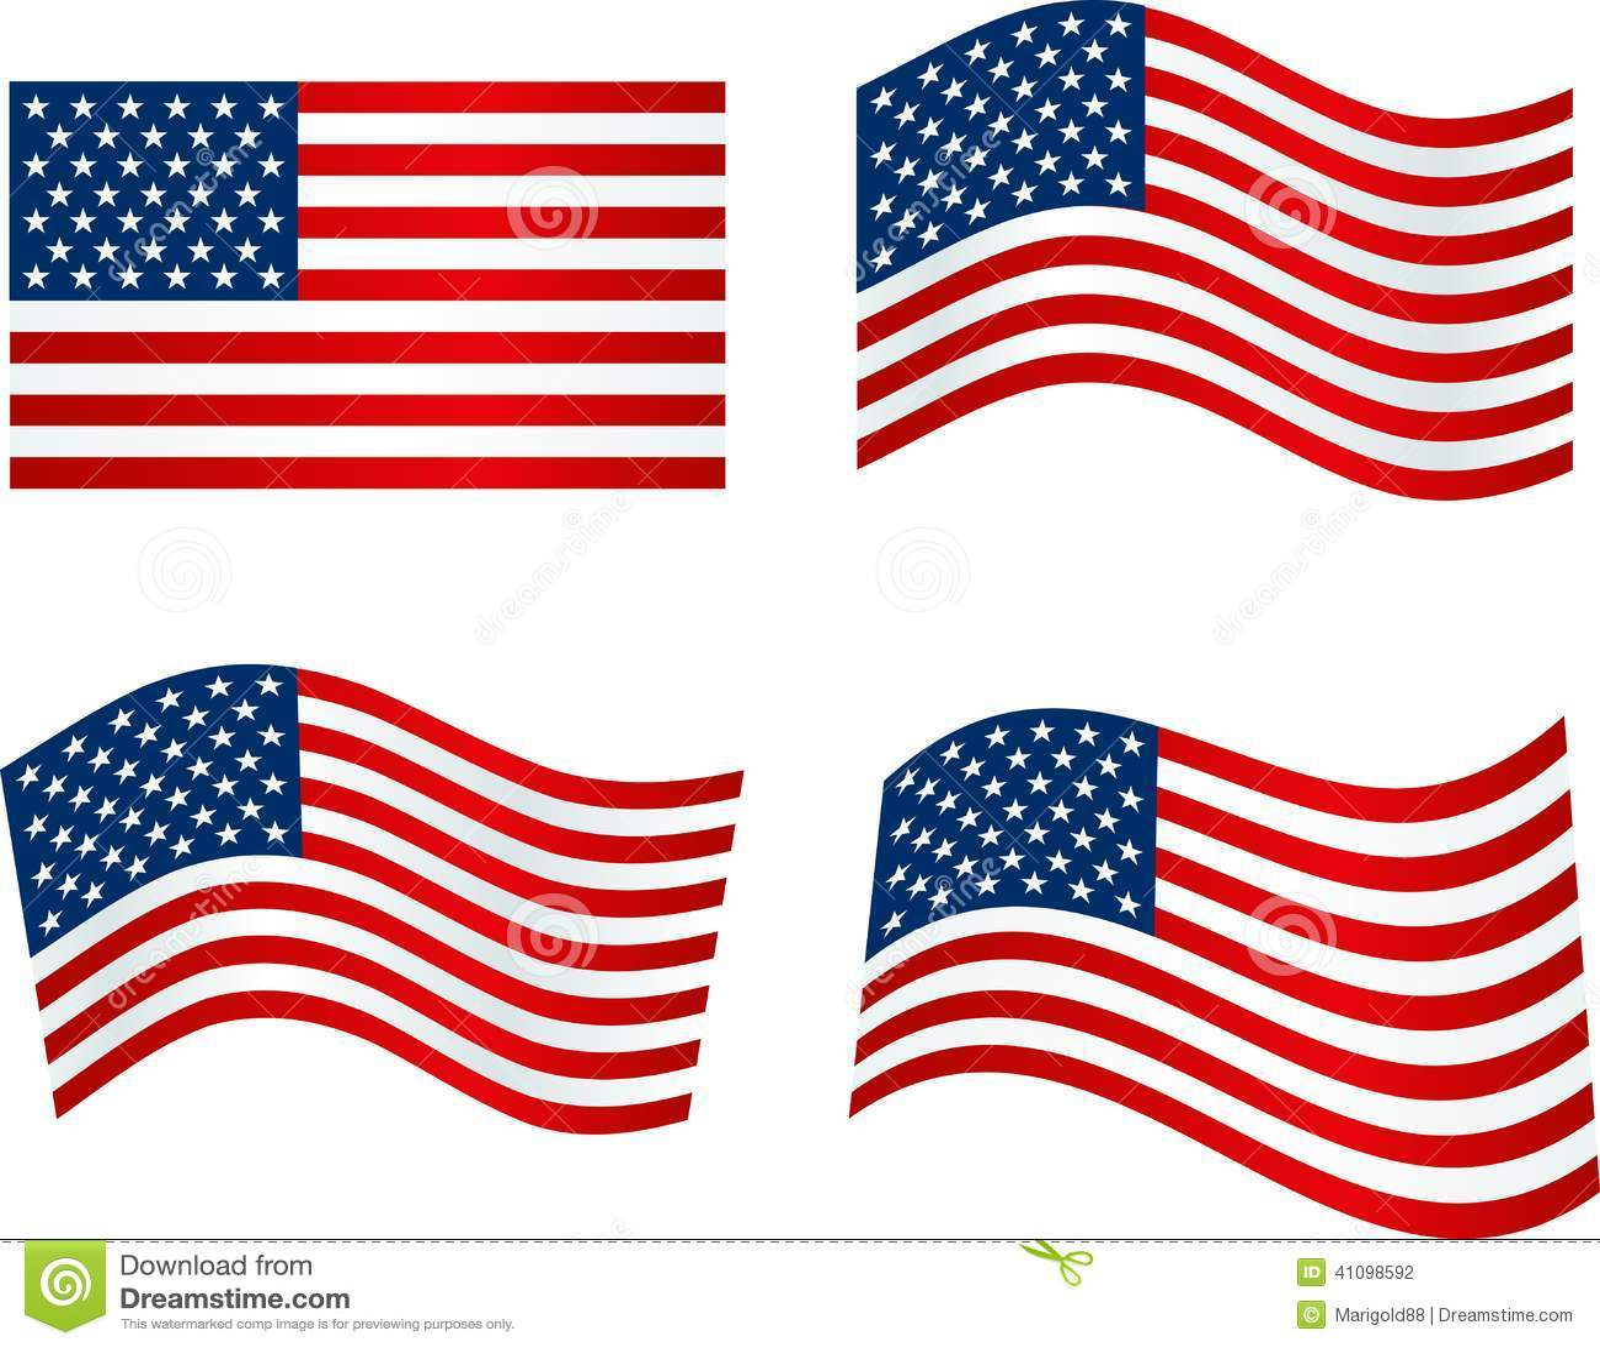 American Flag Stock Vector - Image: 41098592